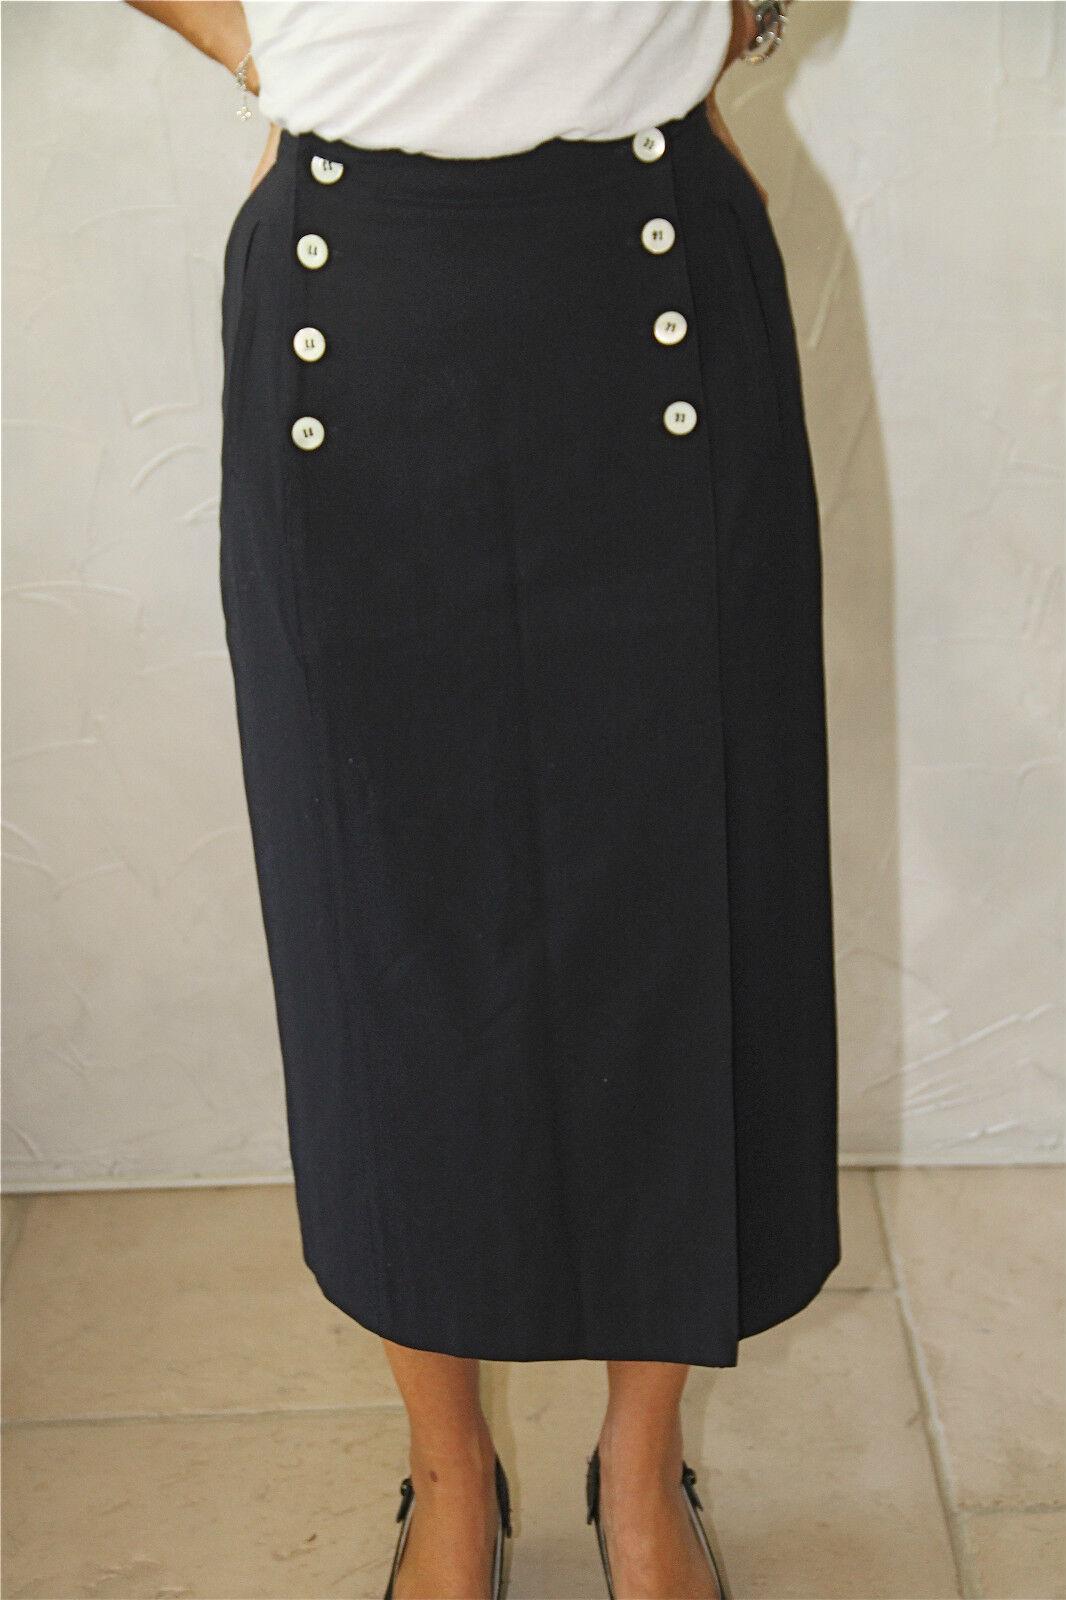 Lujosa falda falda talle alto de lana marina INFINITIF tamaño 36-38